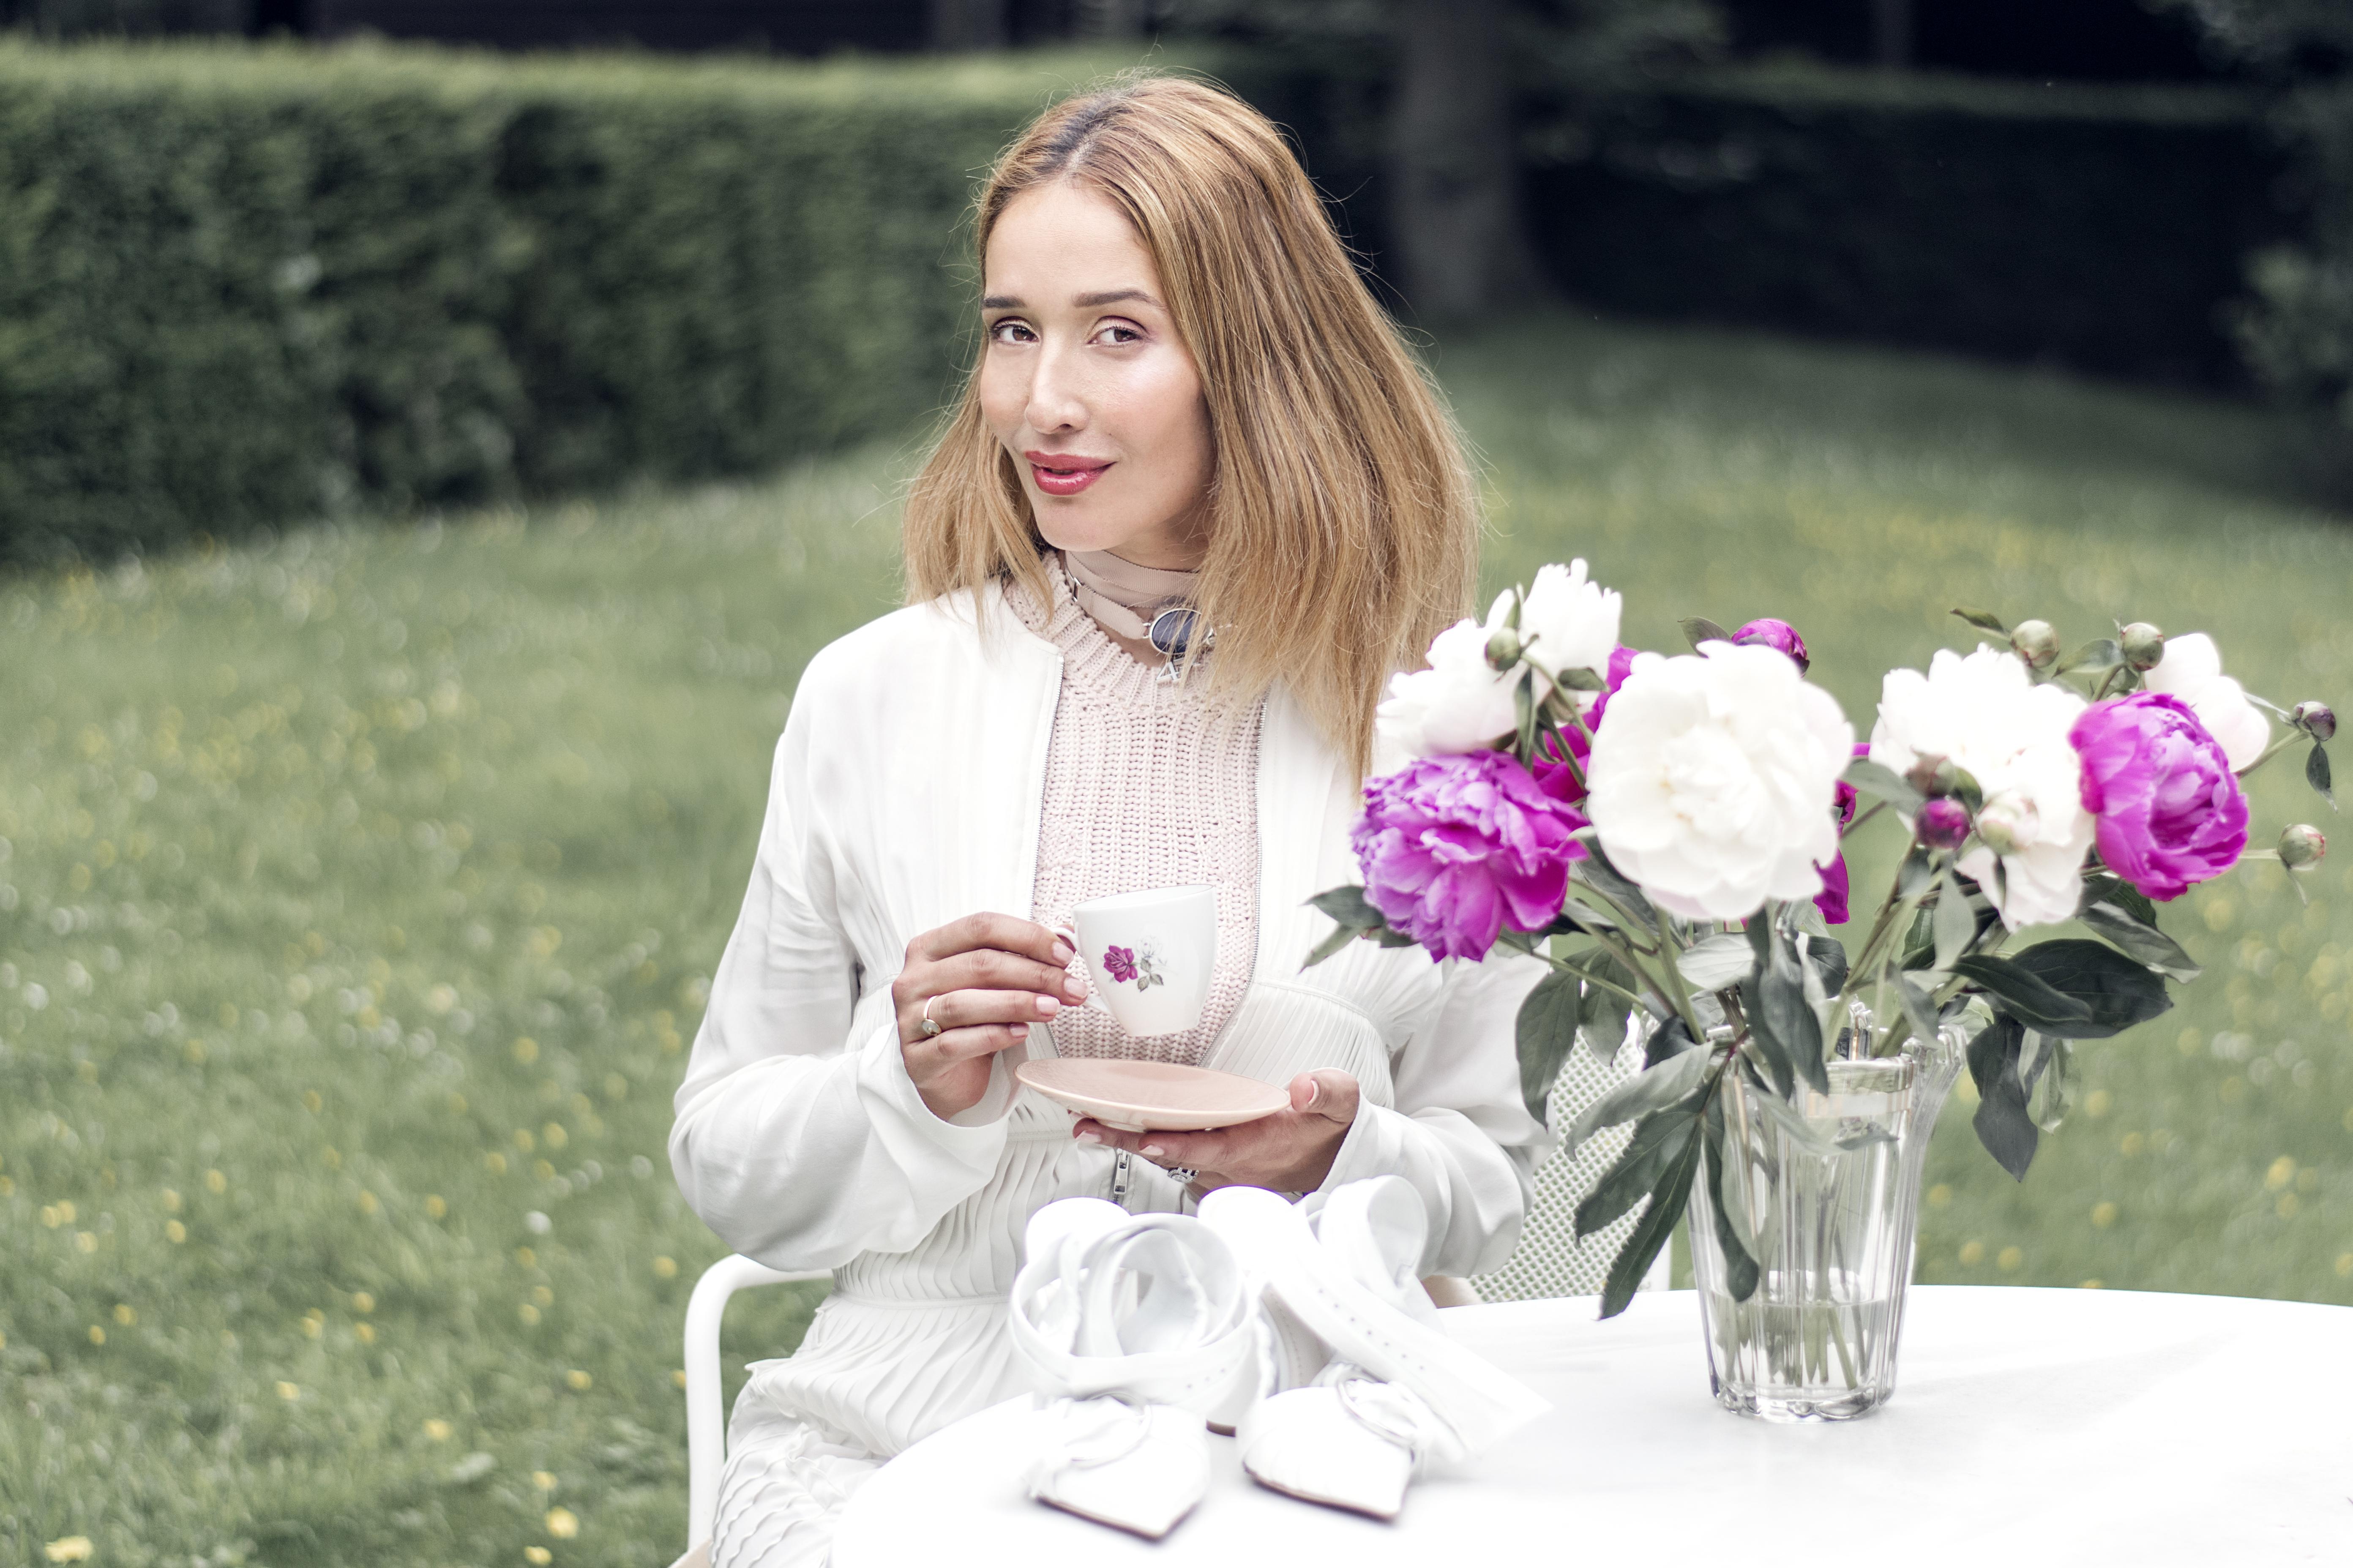 fotograaf: Valeriya Maltsava model: Tiany Kiriloff